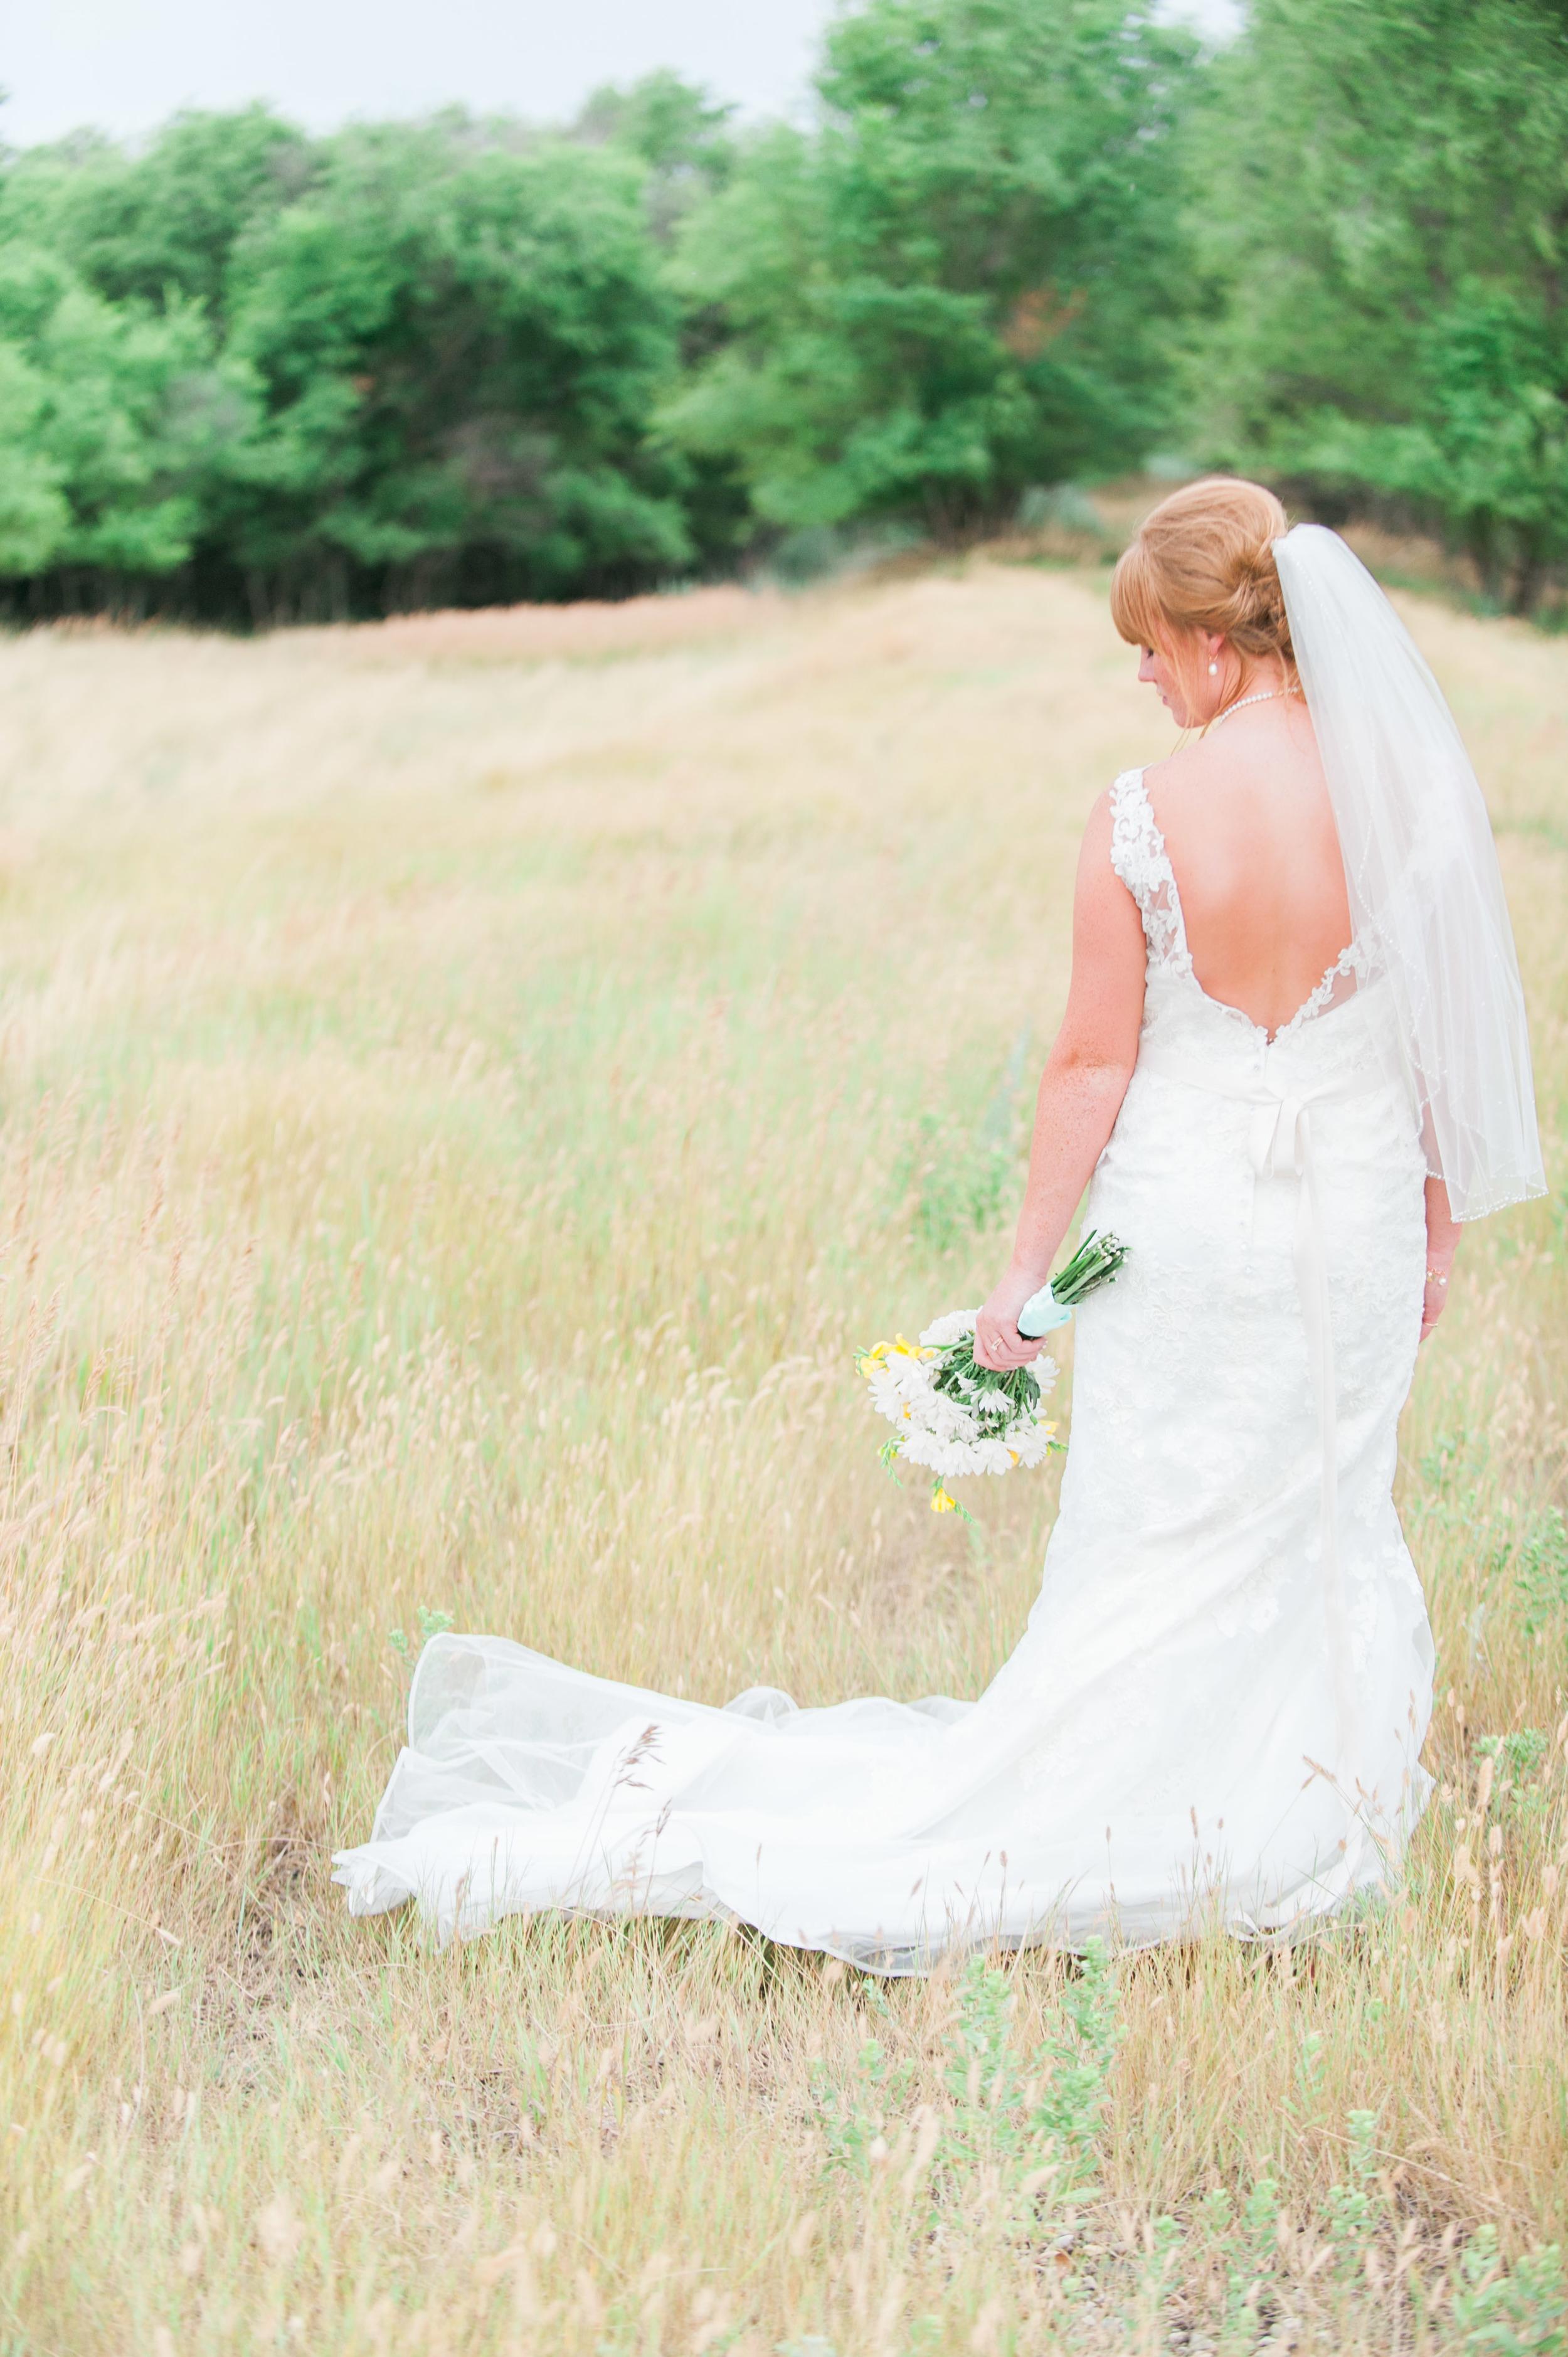 wedding-photography-33.jpg